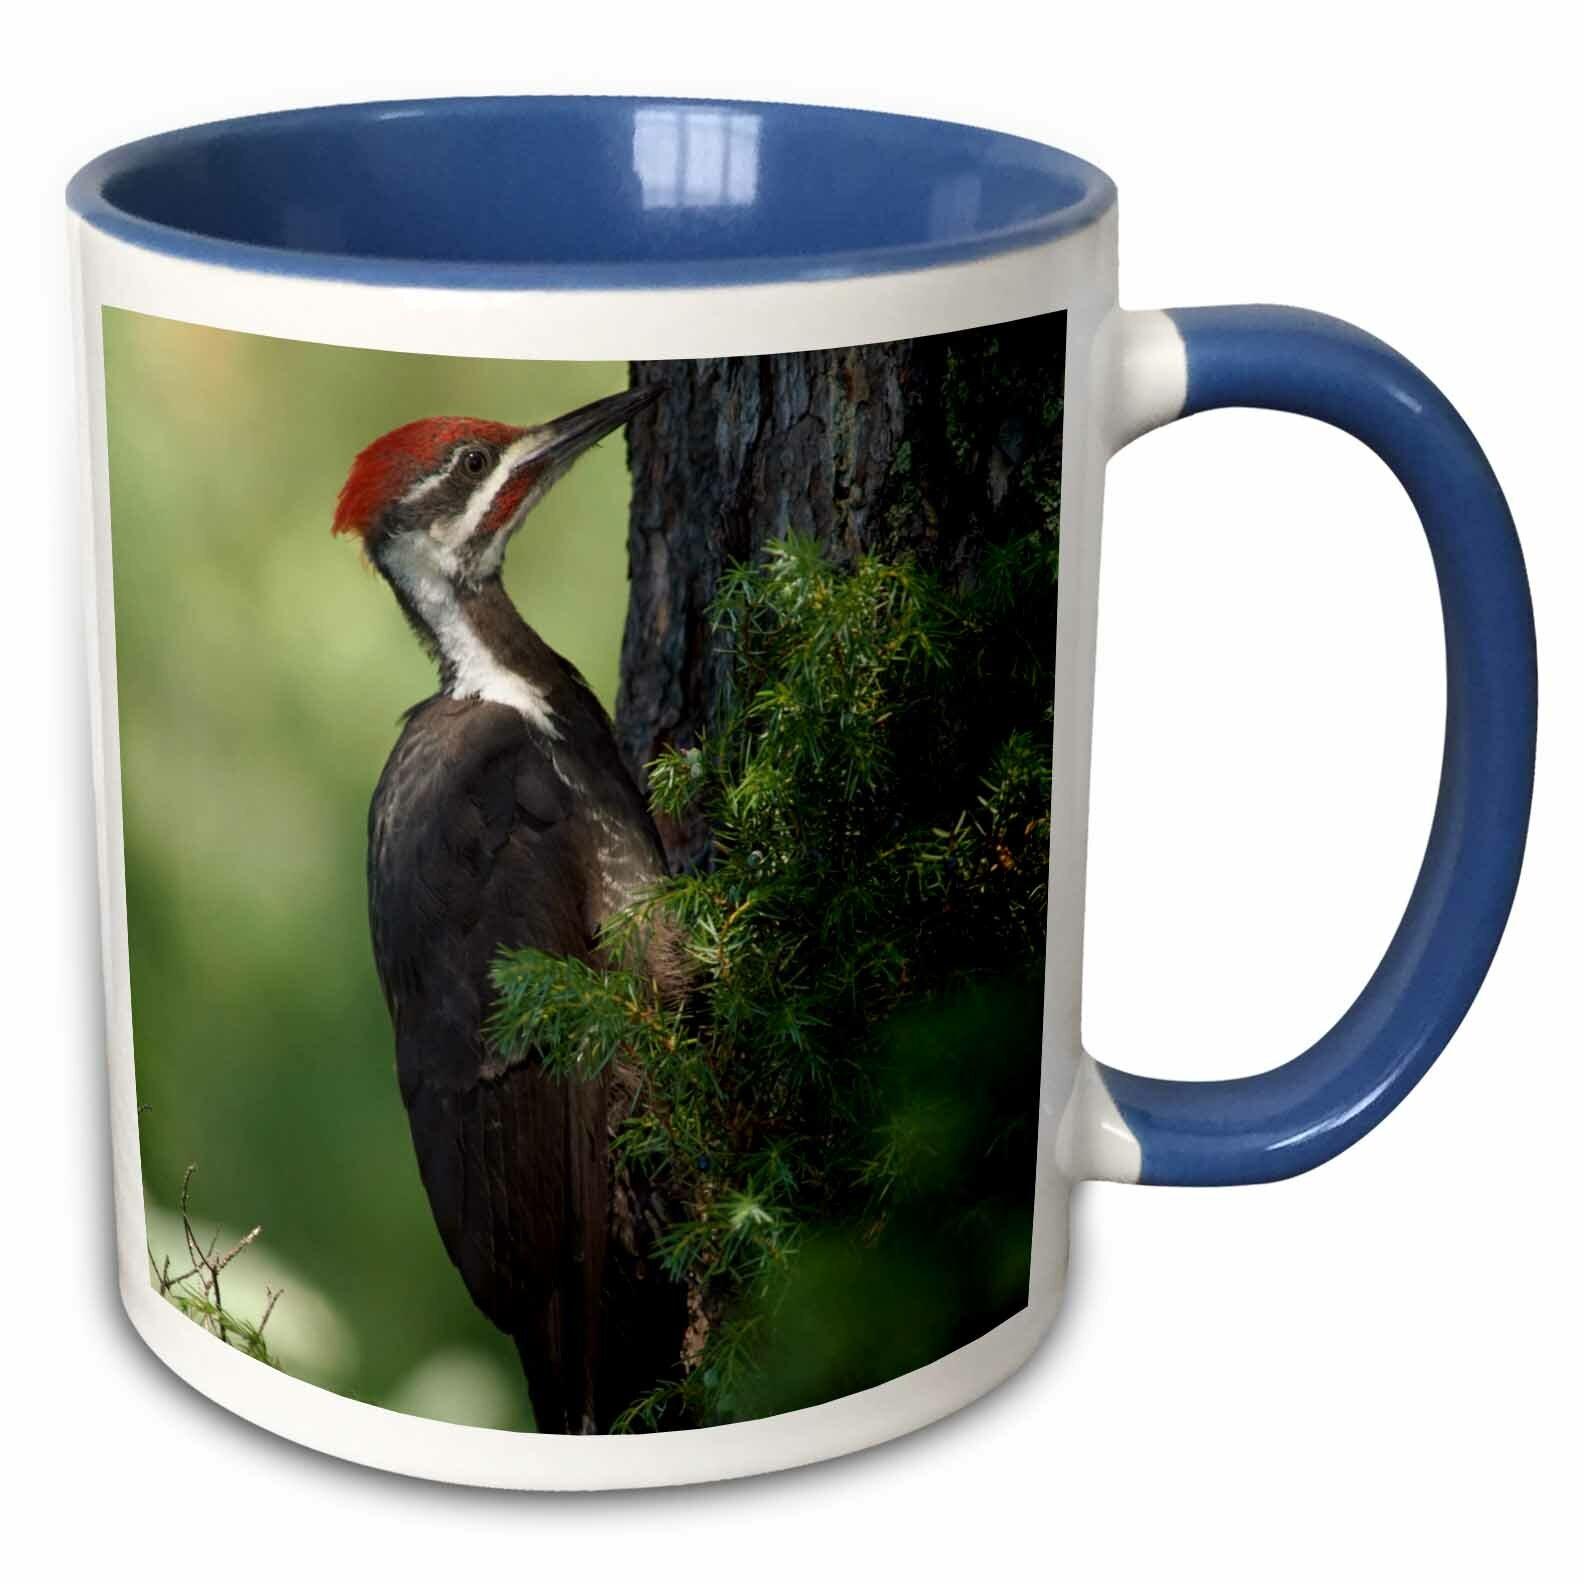 East Urban Home Pileated Woodpecker Bird Whitefish Montana Coffee Mug Wayfair